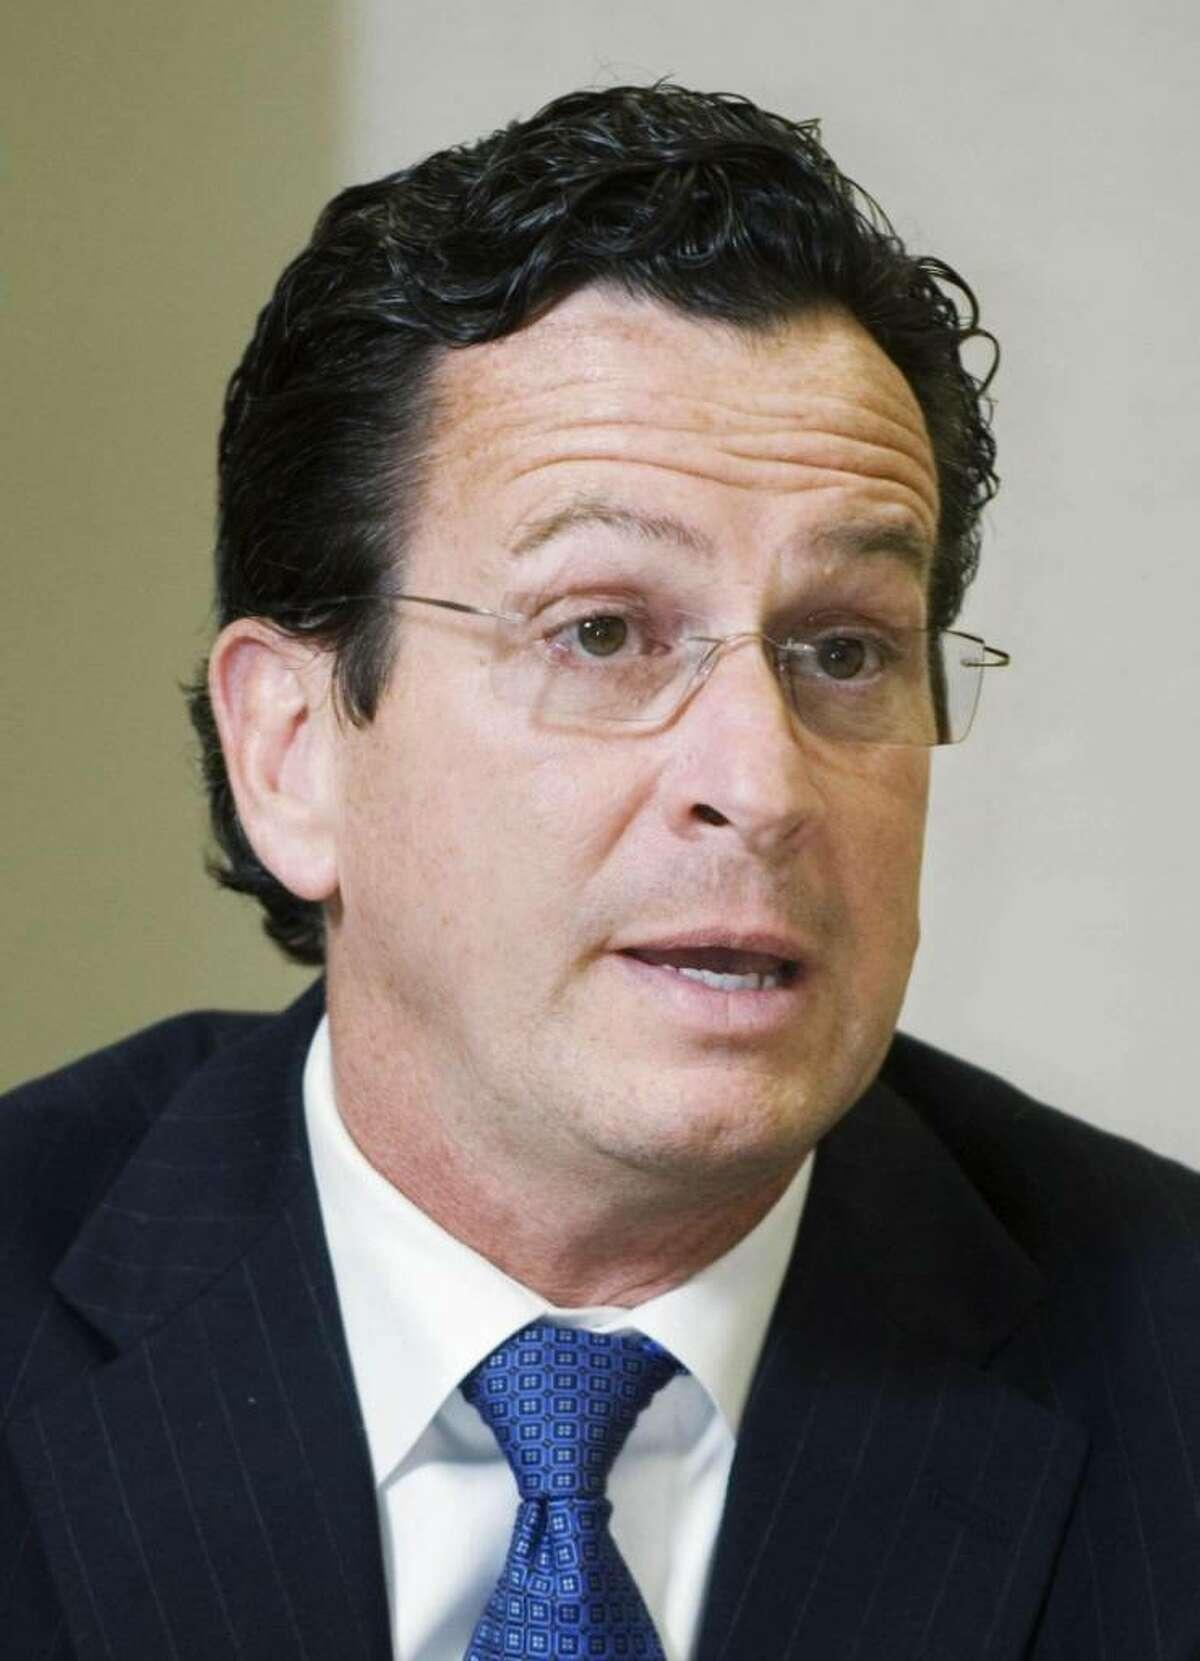 former Stamford Mayor Dannel P. Malloy